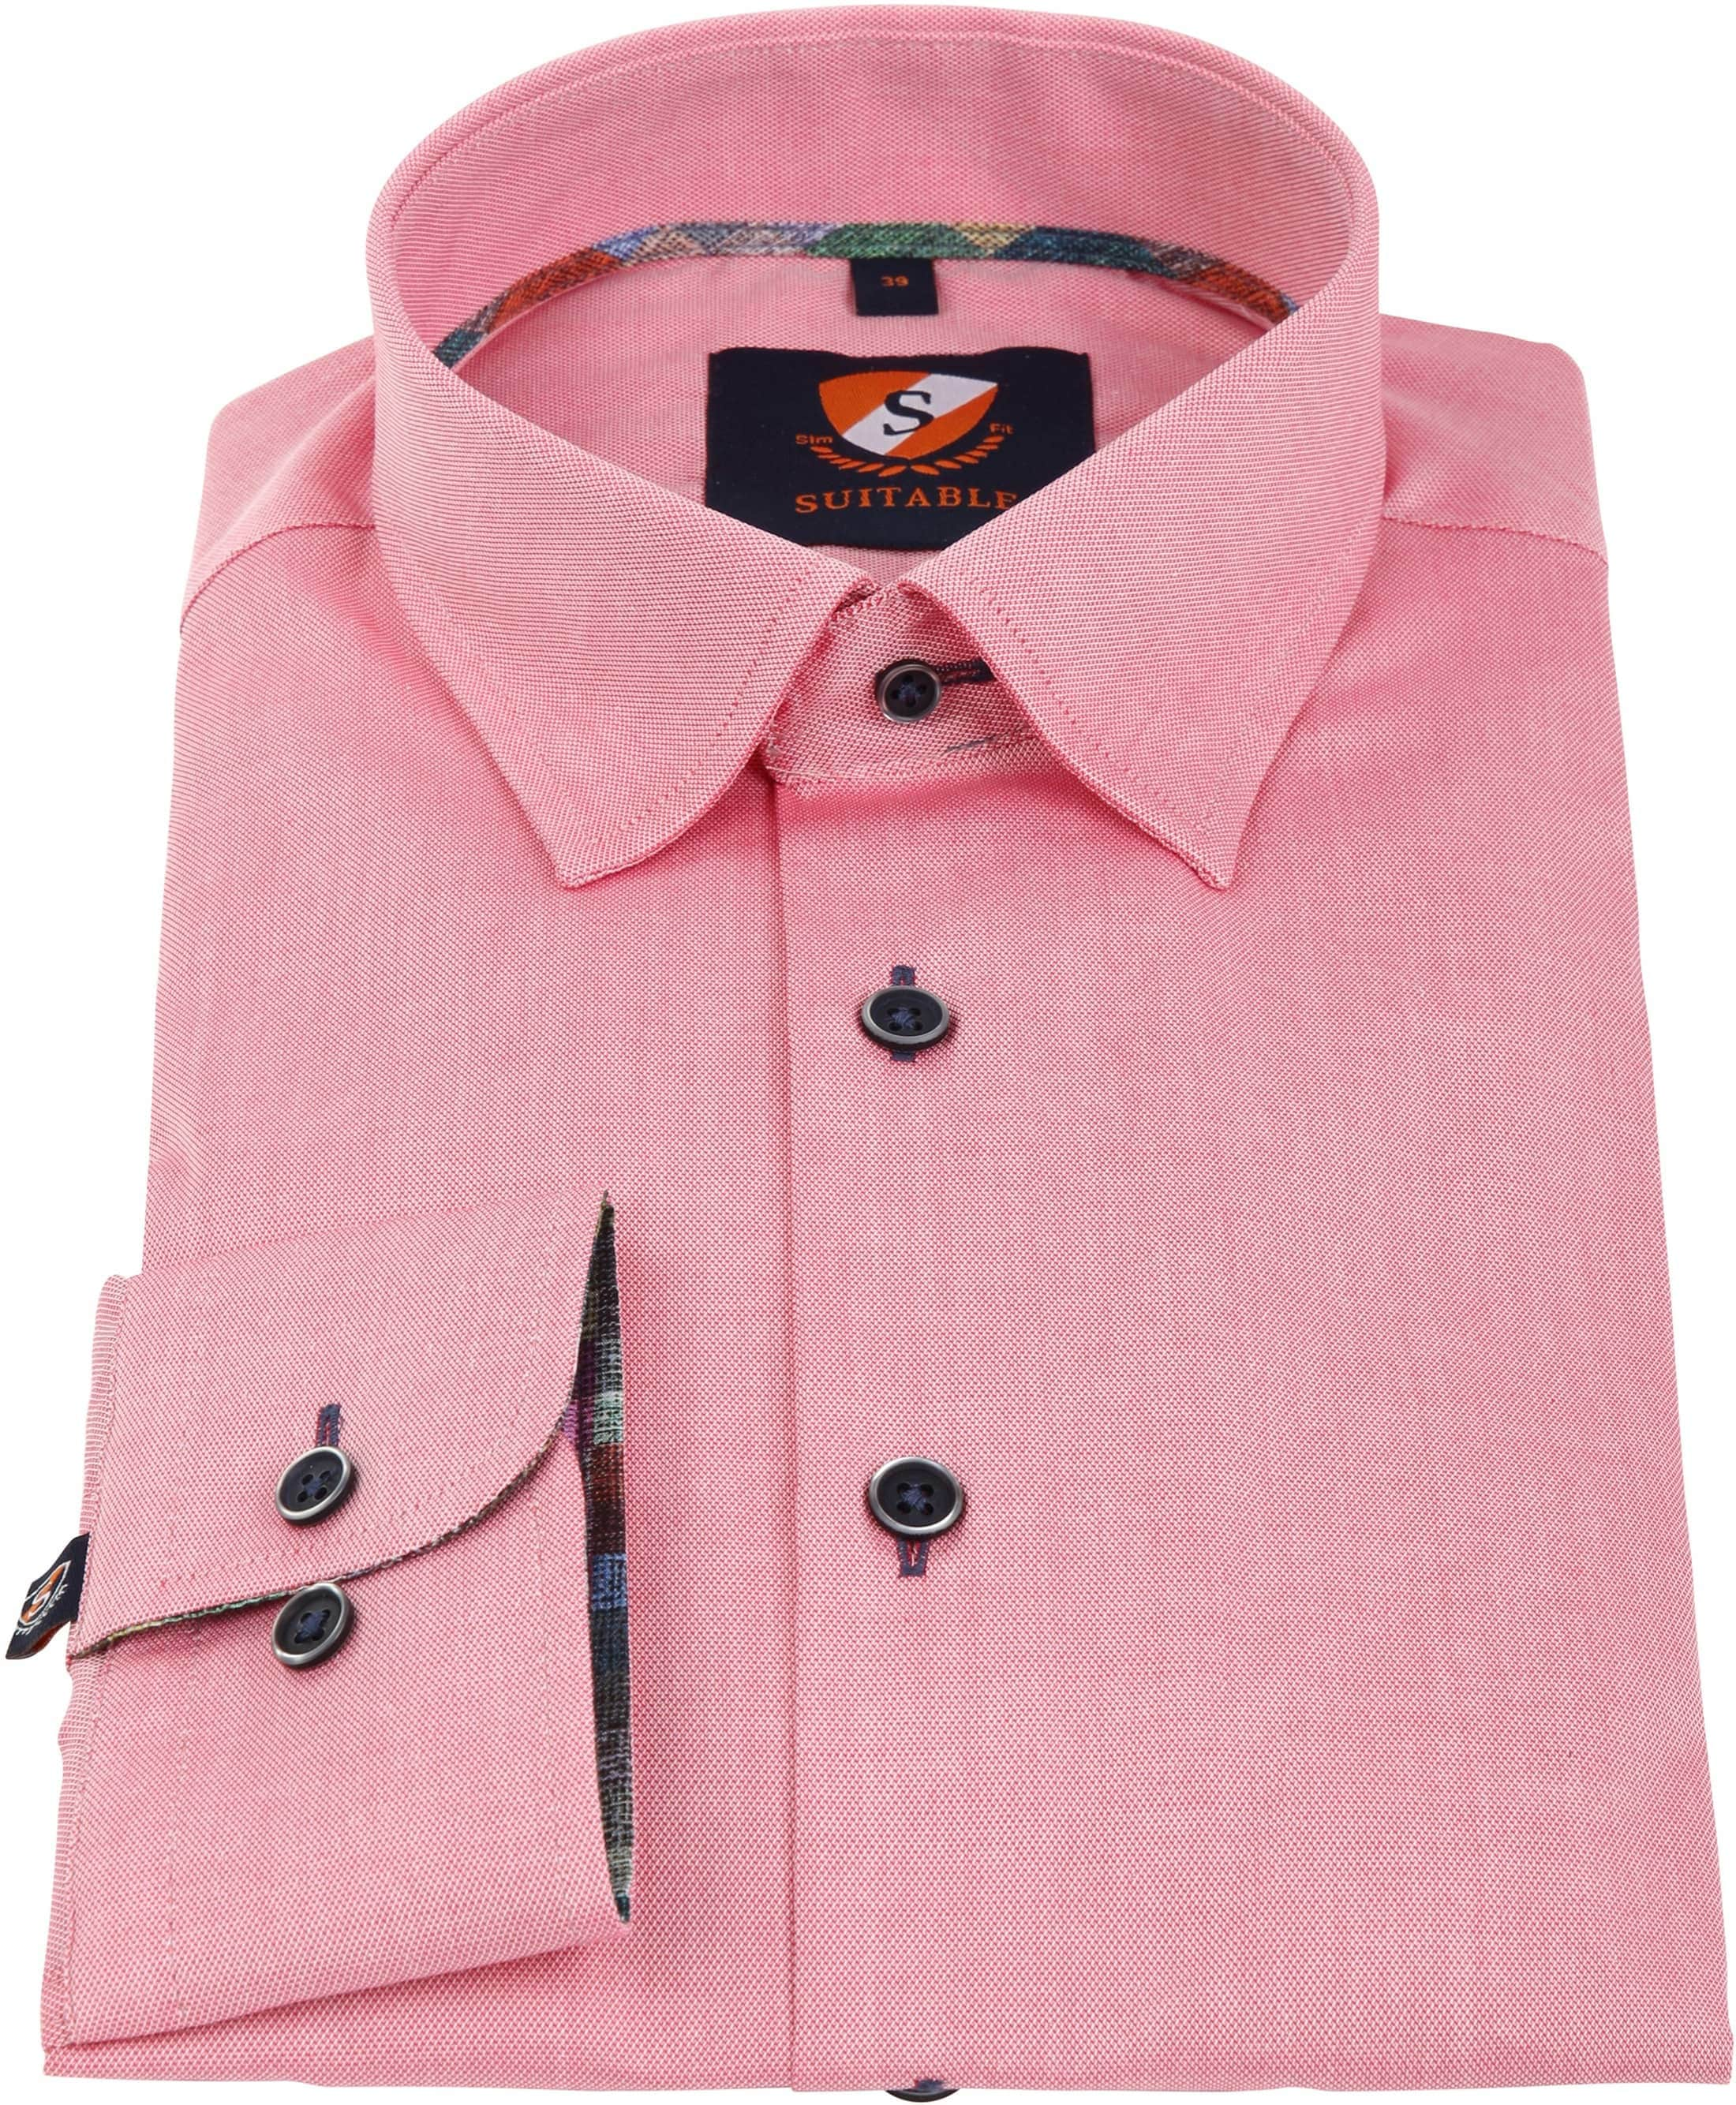 Suitable Overhemd Donkerroze 183-4 foto 2